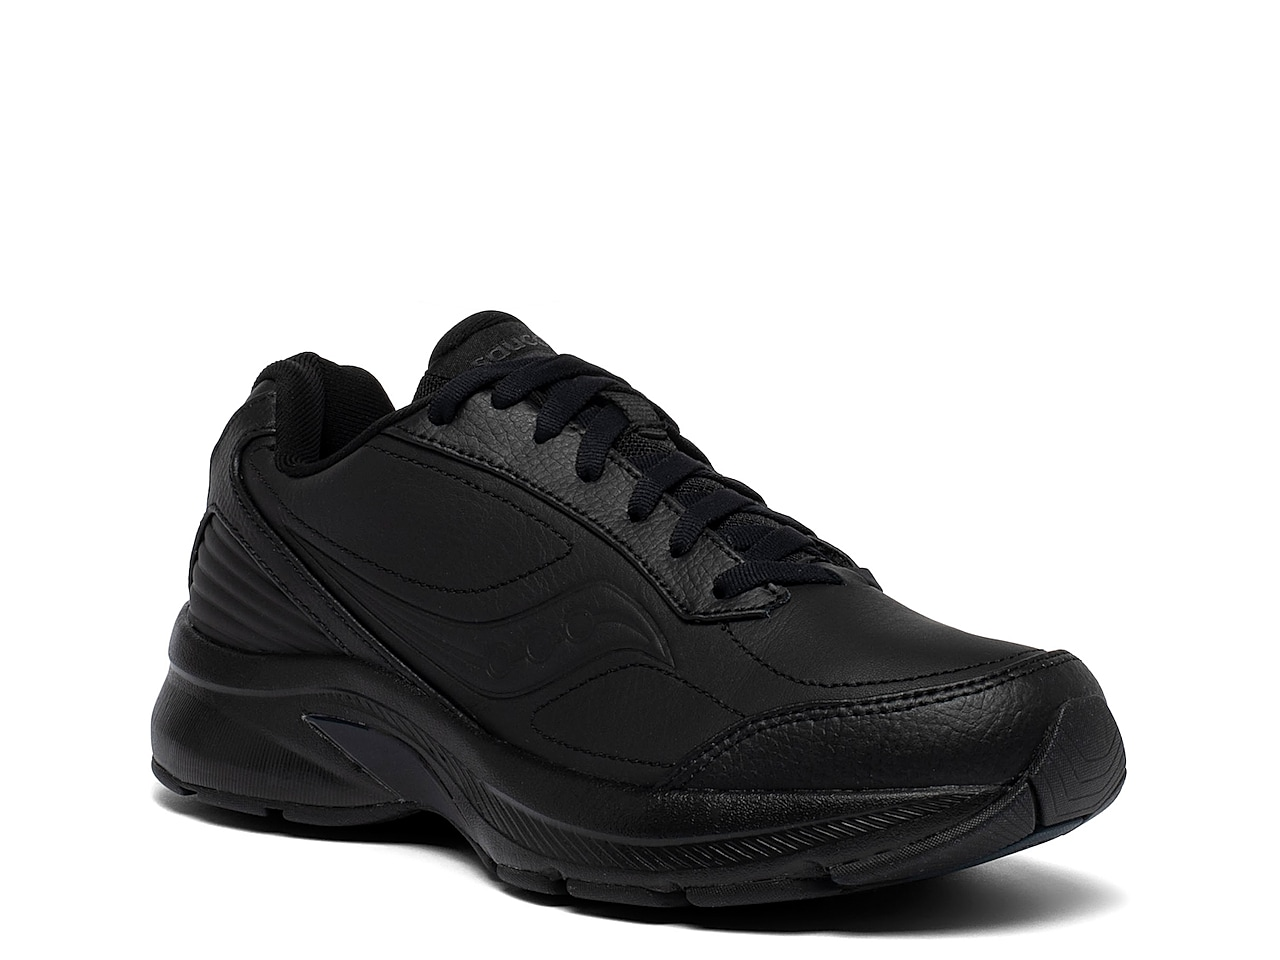 Saucony Omni Walker 3 Walking Shoe - Women's